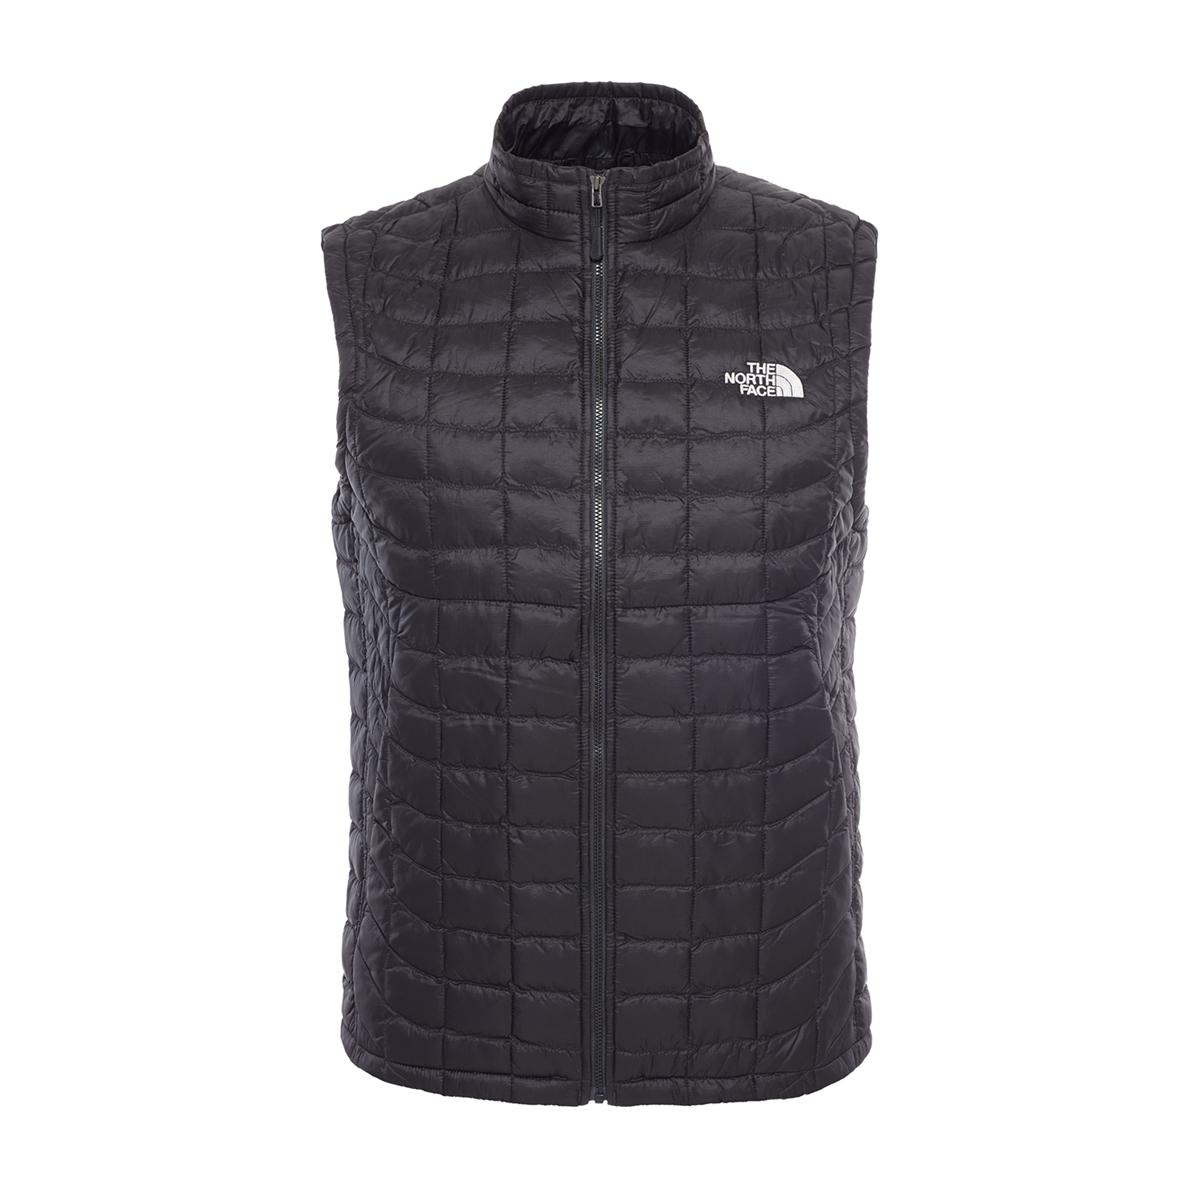 the north face thermoball vest insulating jackets epictv shop. Black Bedroom Furniture Sets. Home Design Ideas